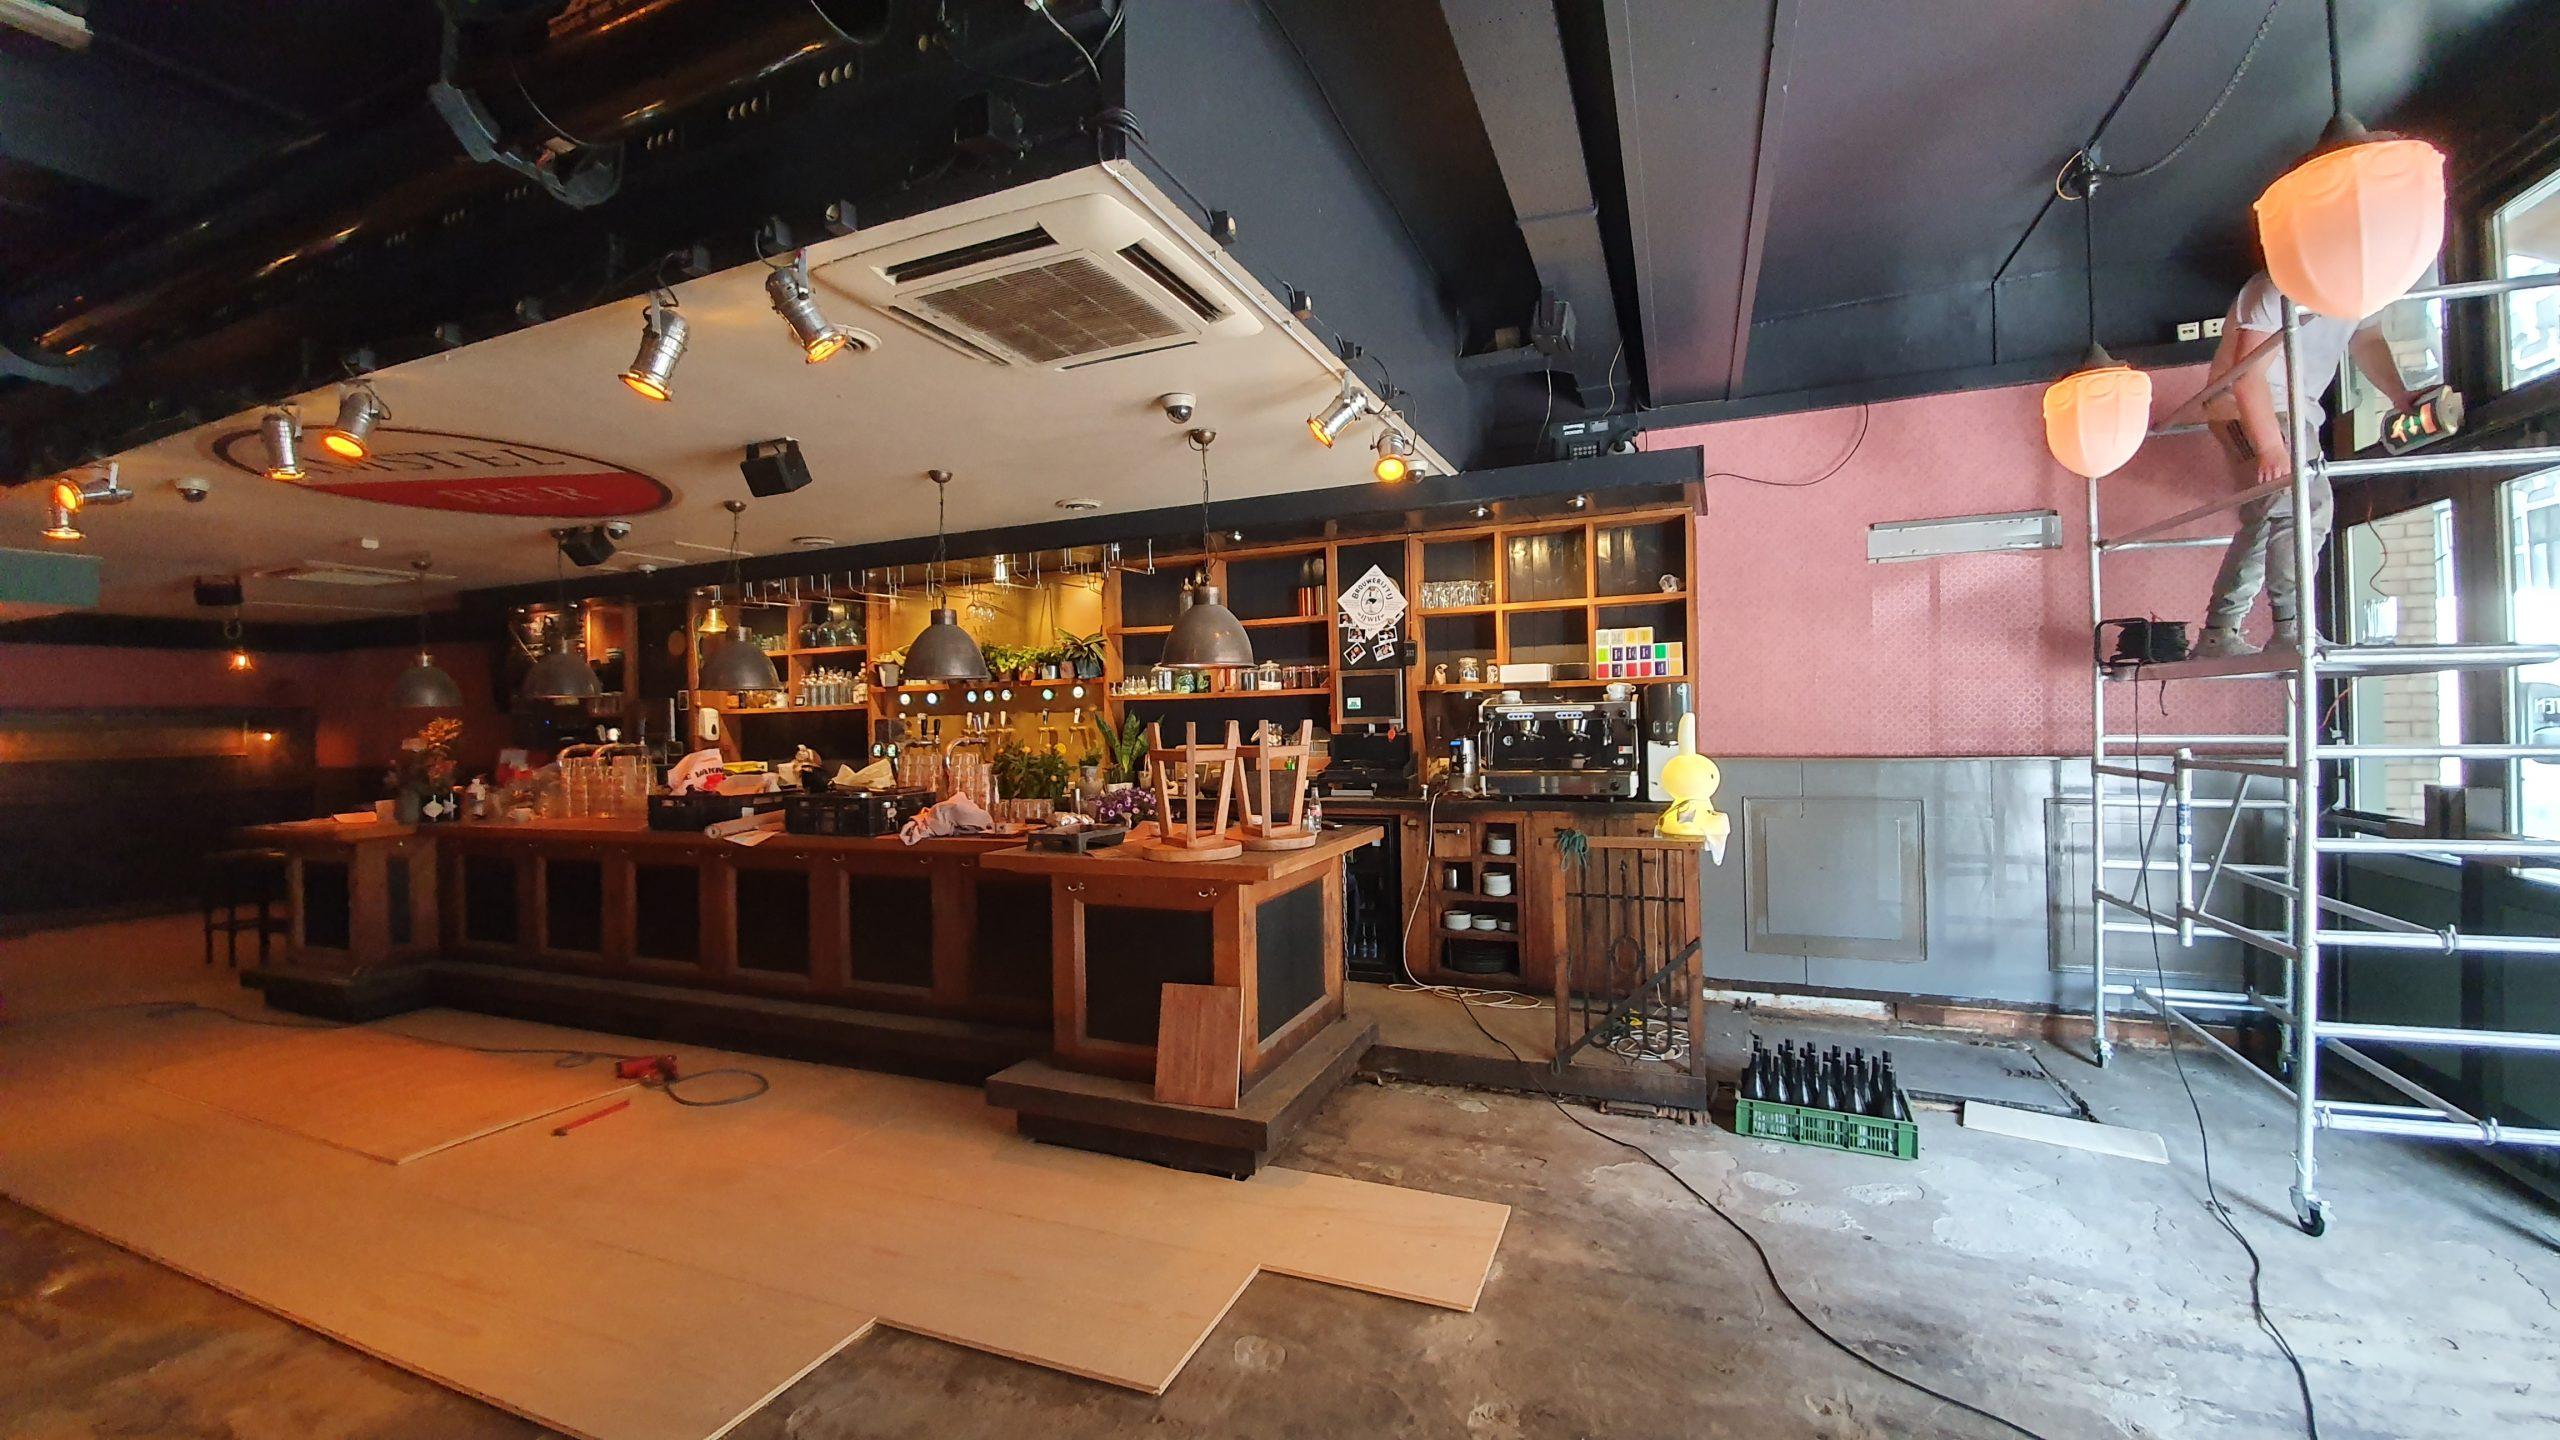 Vloer en bar